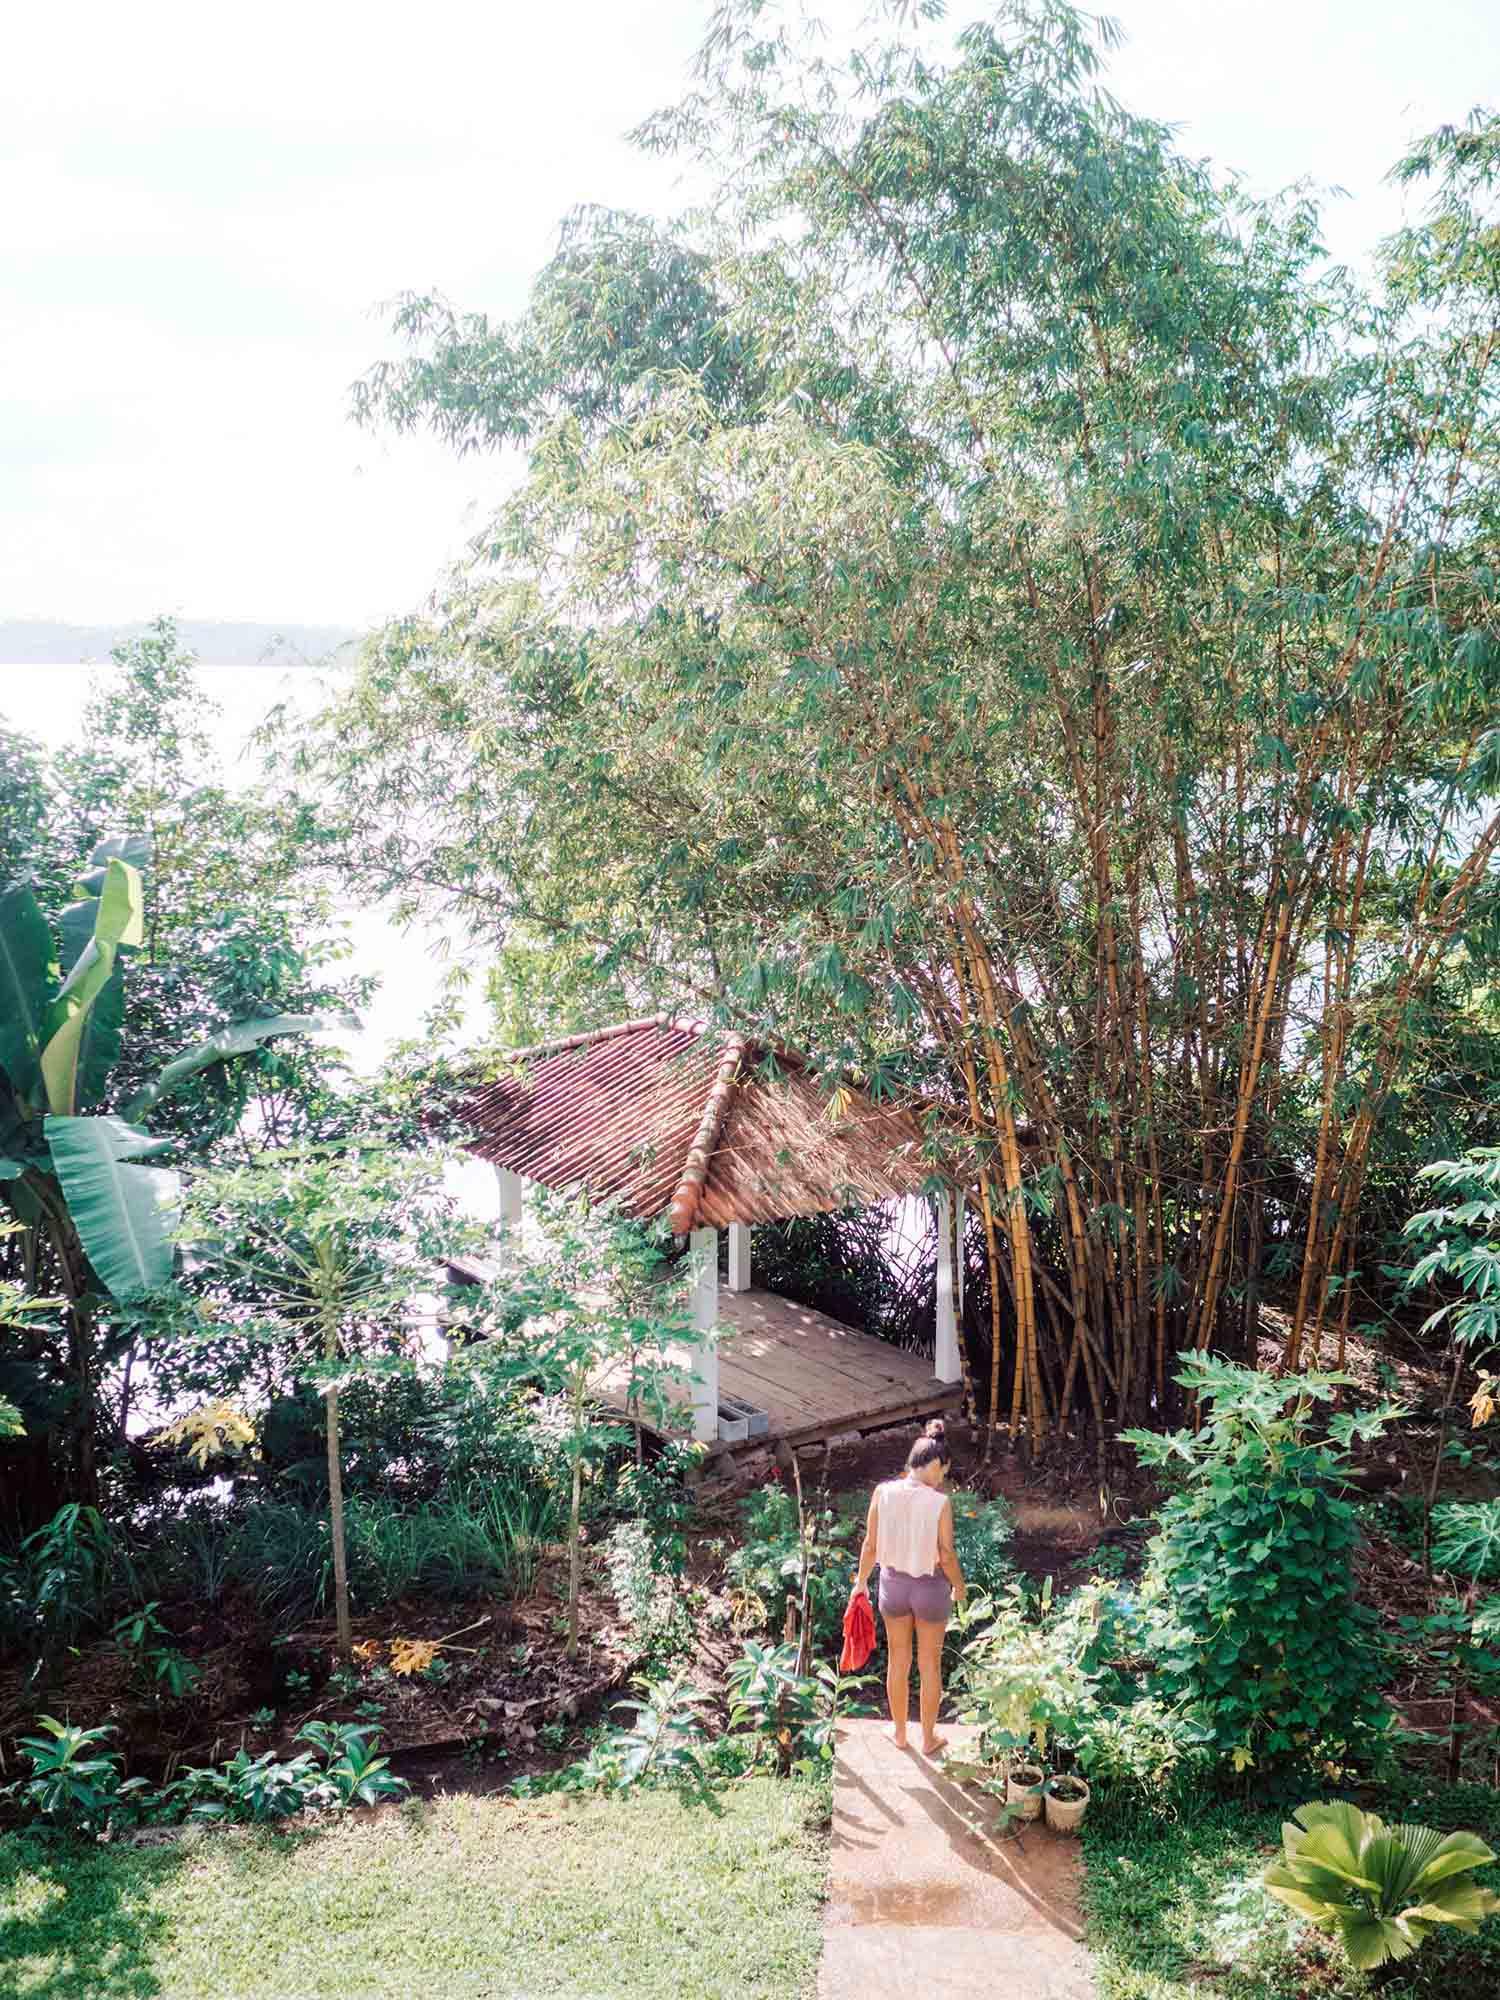 Lanka Yoga - Yoga School and Retreat Center, Koggala Lake, Sri Lanka